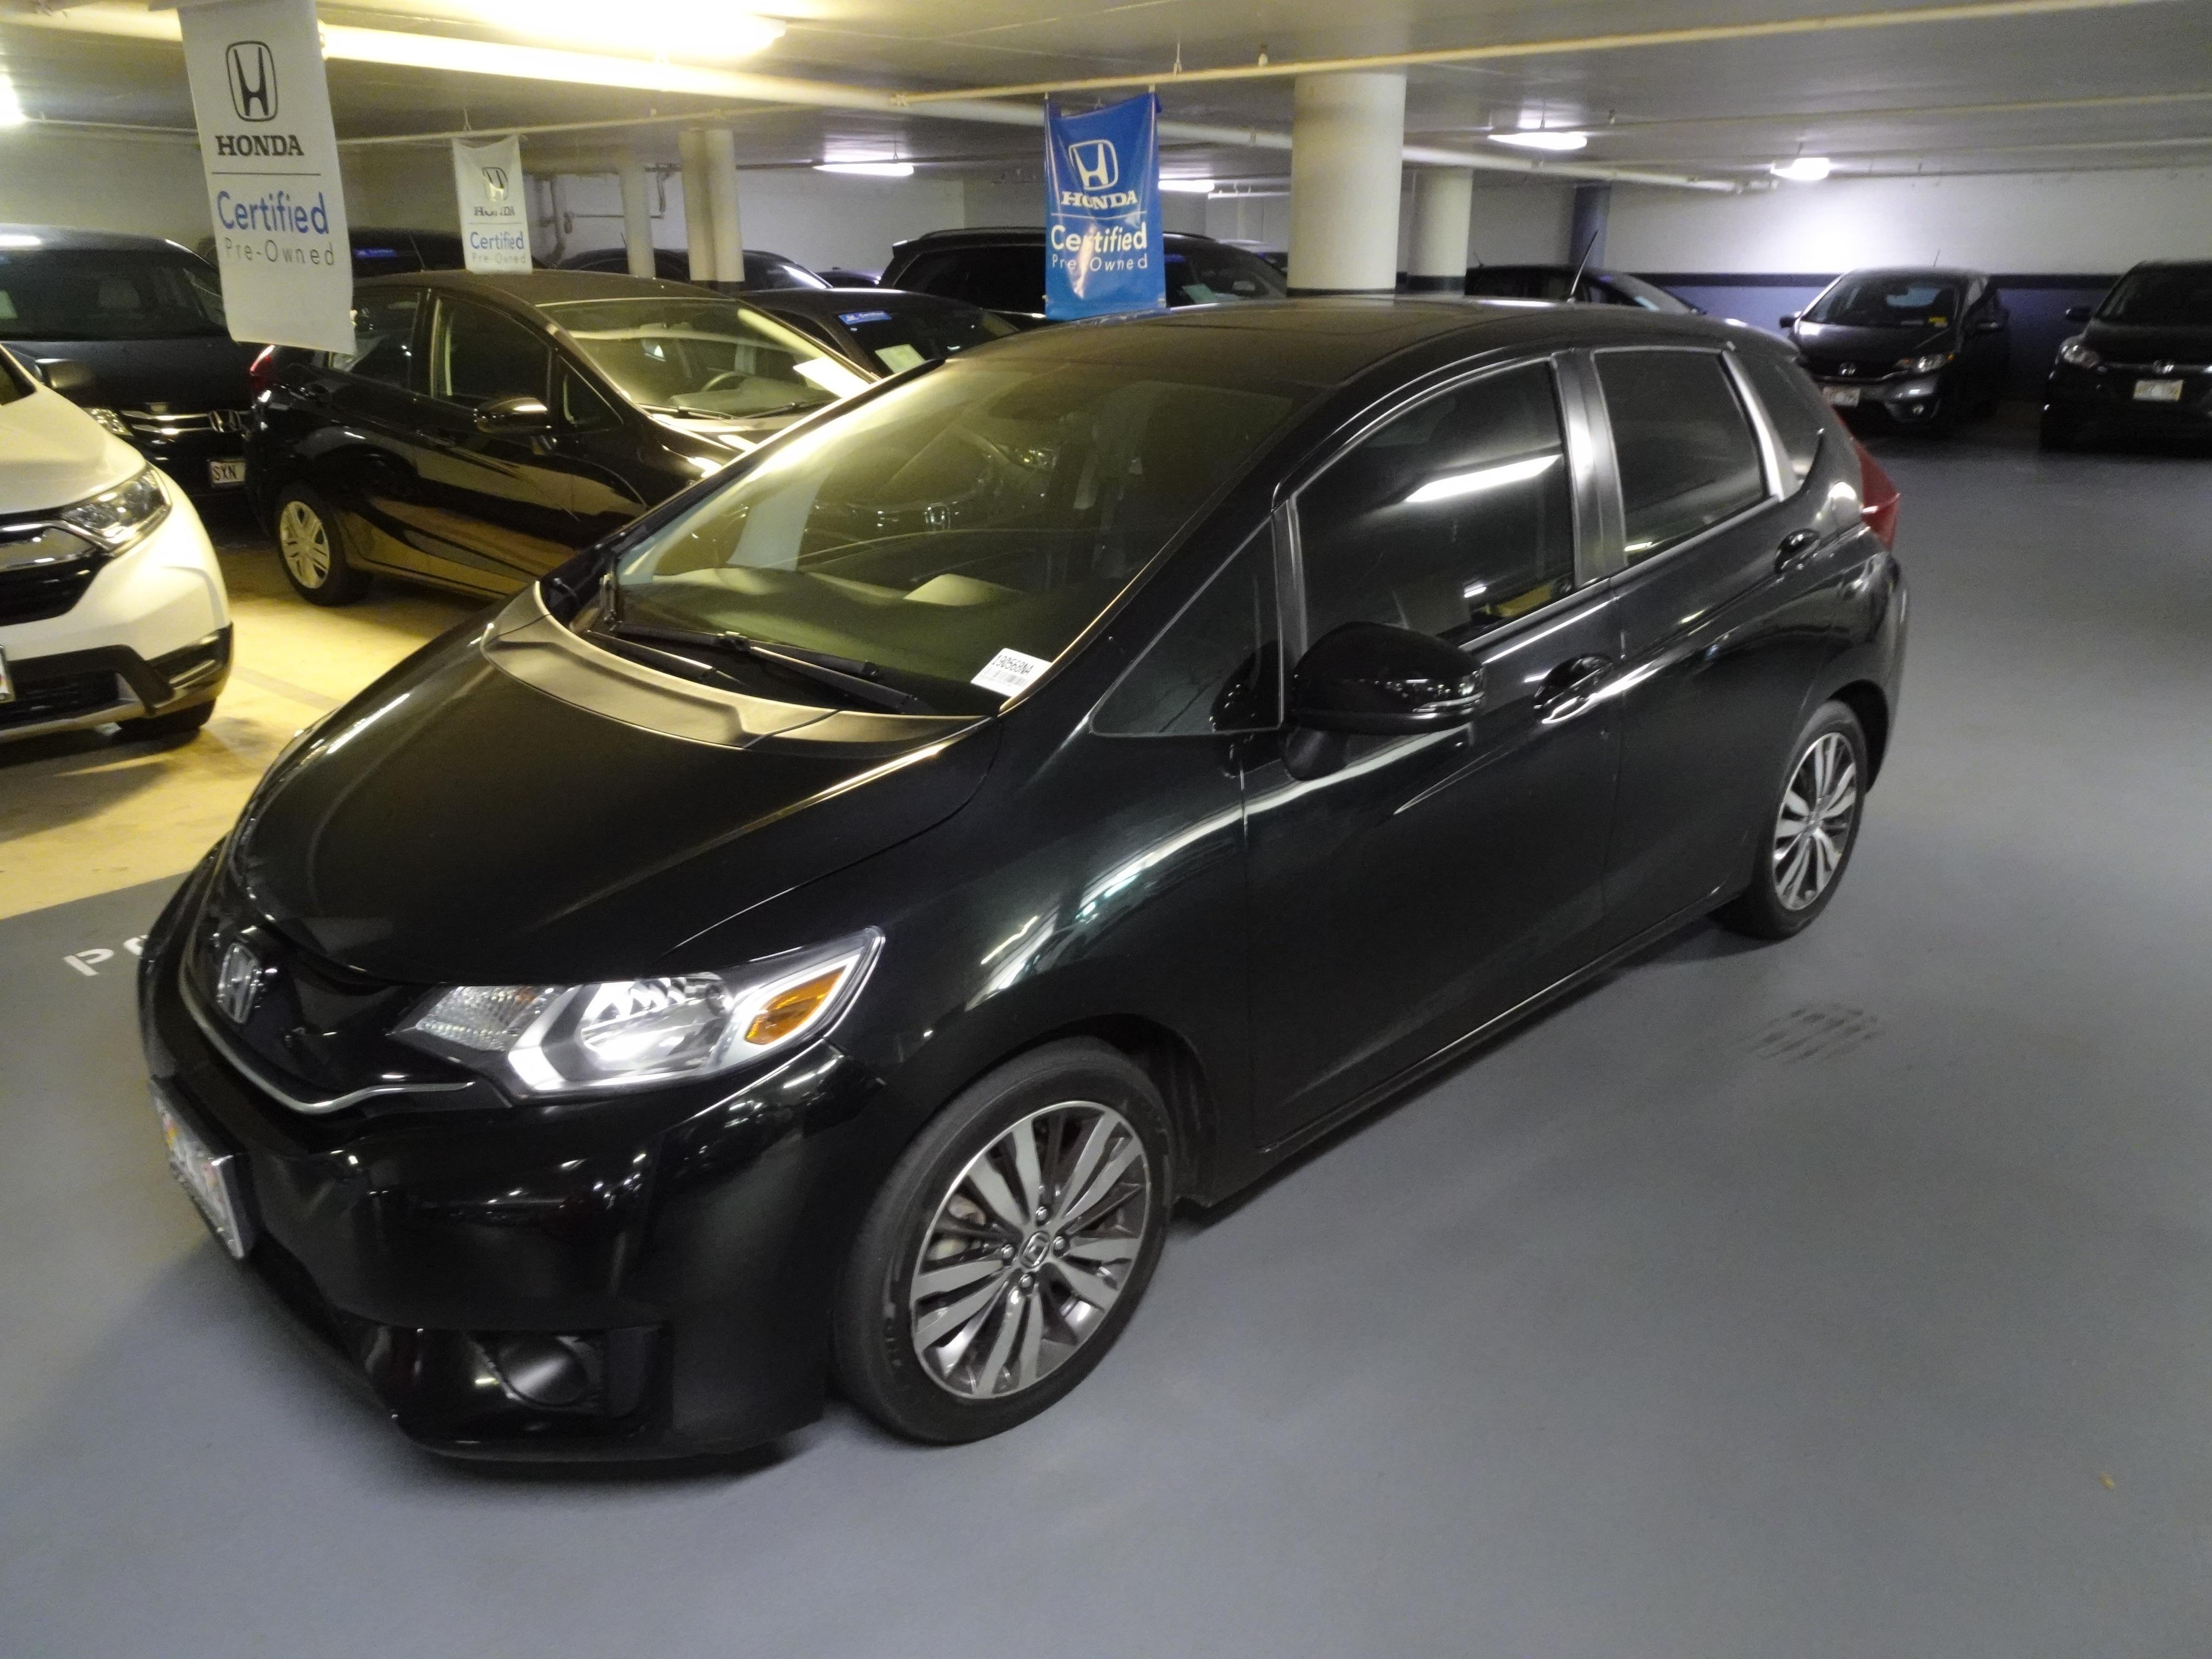 Used 2015 Honda Fit EX-L Hatchback in Honolulu